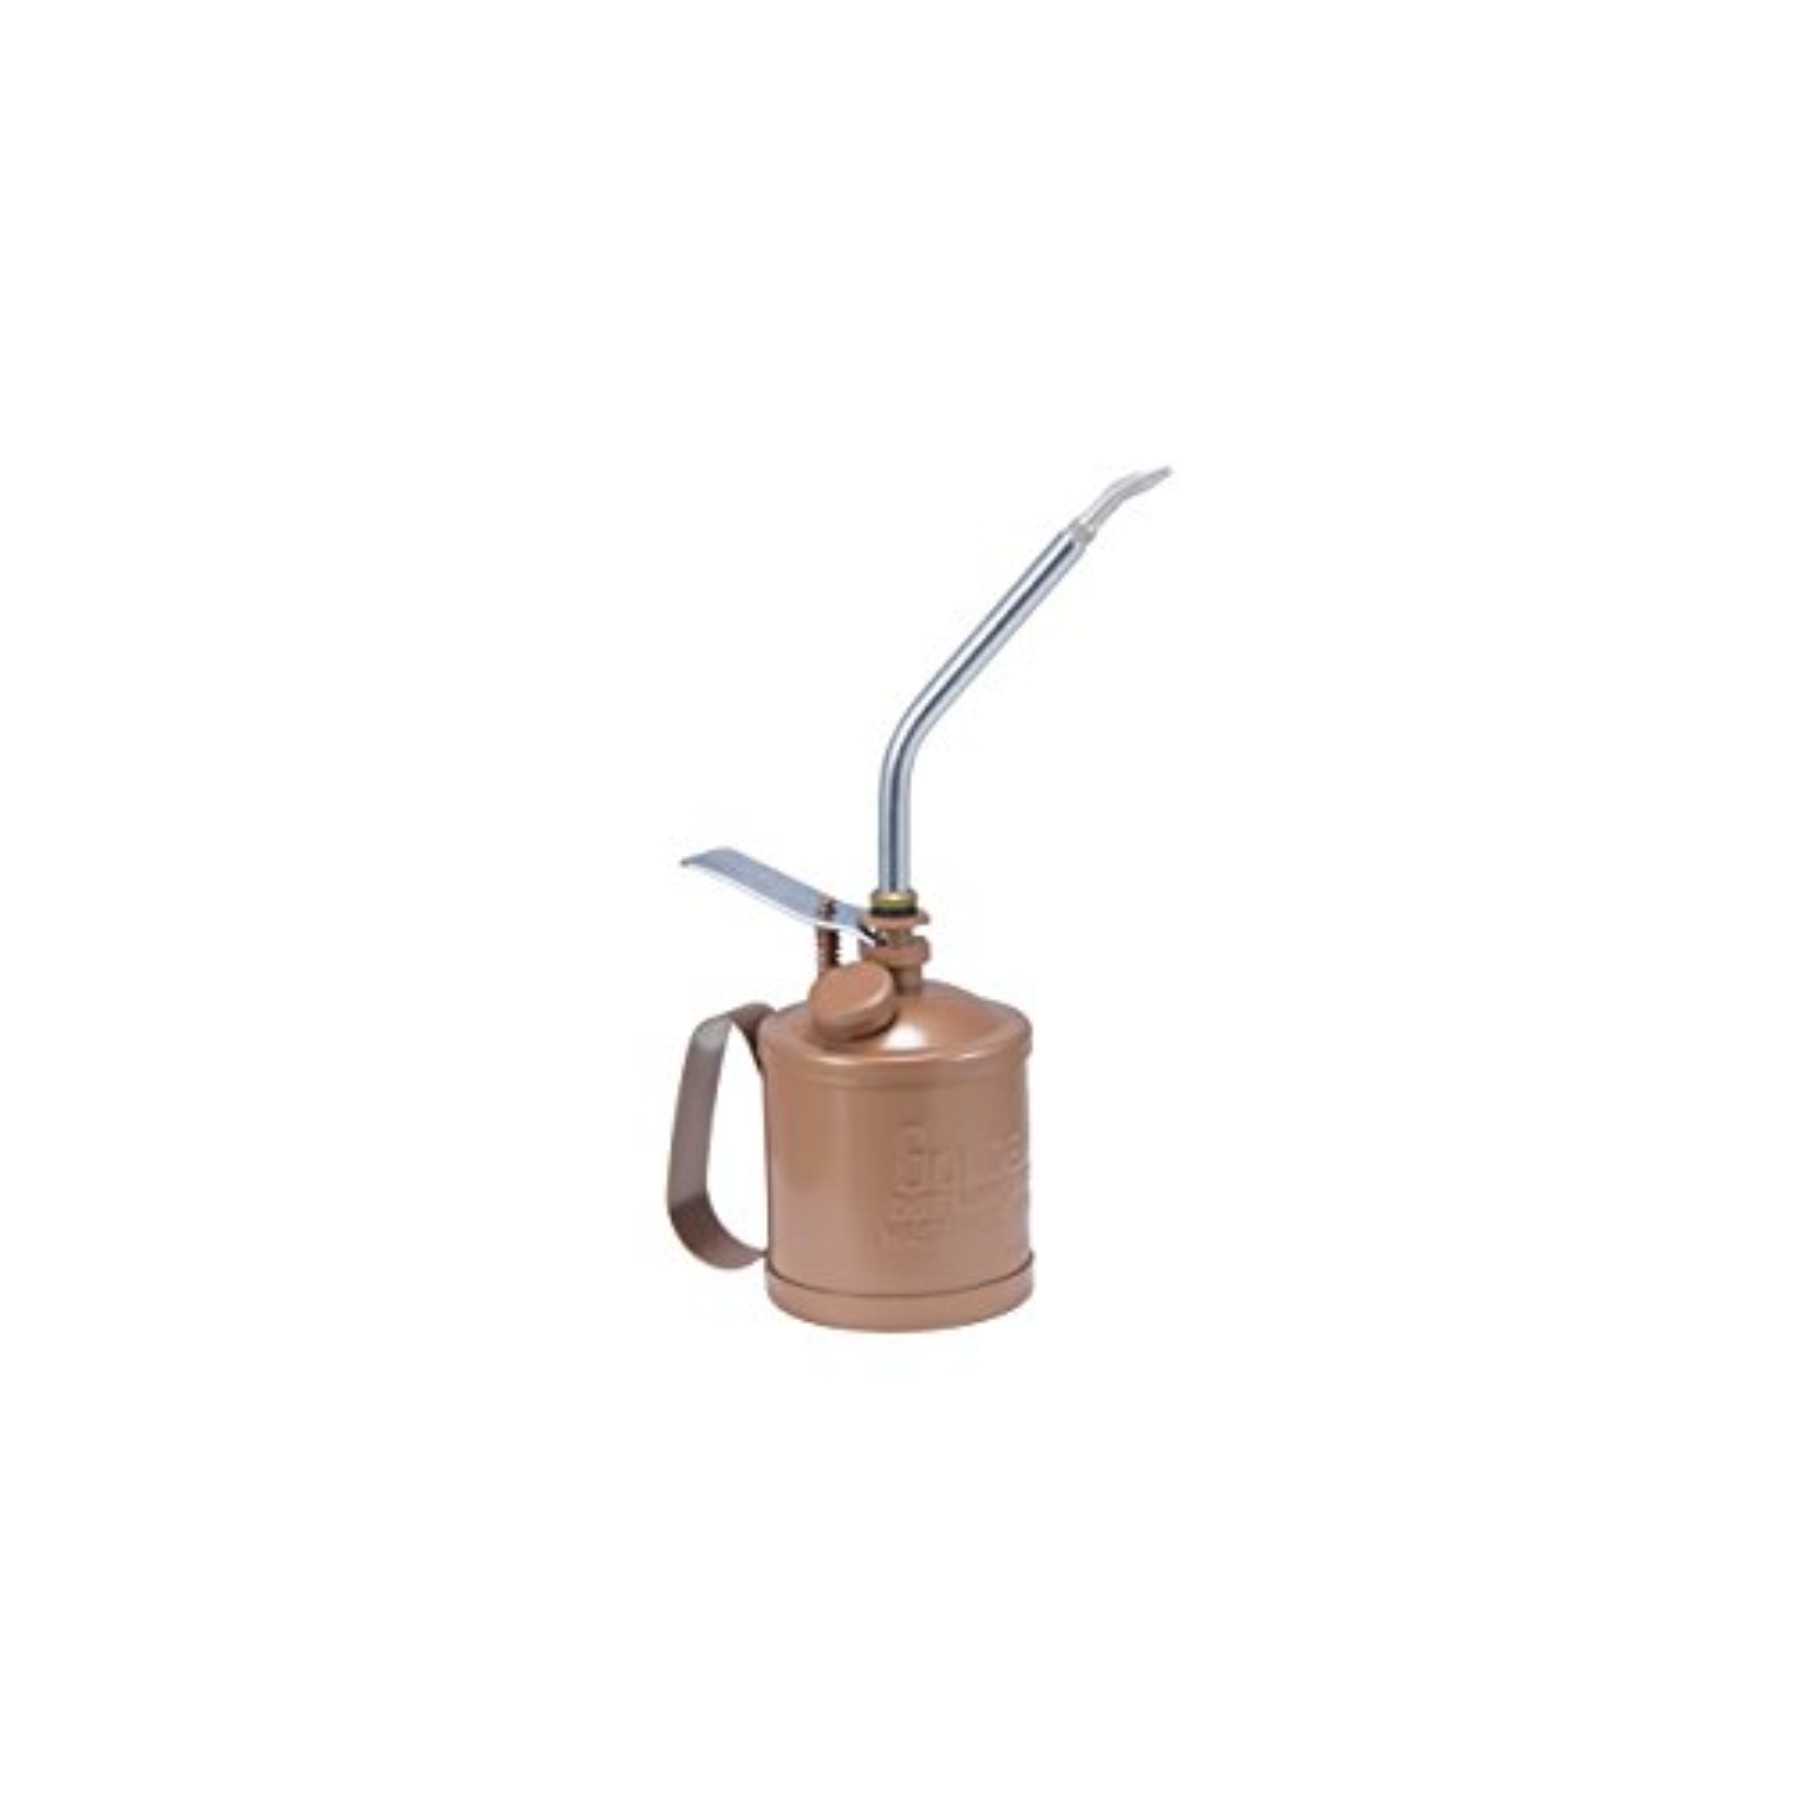 16 Ounce 8-Inch Spout Oiler